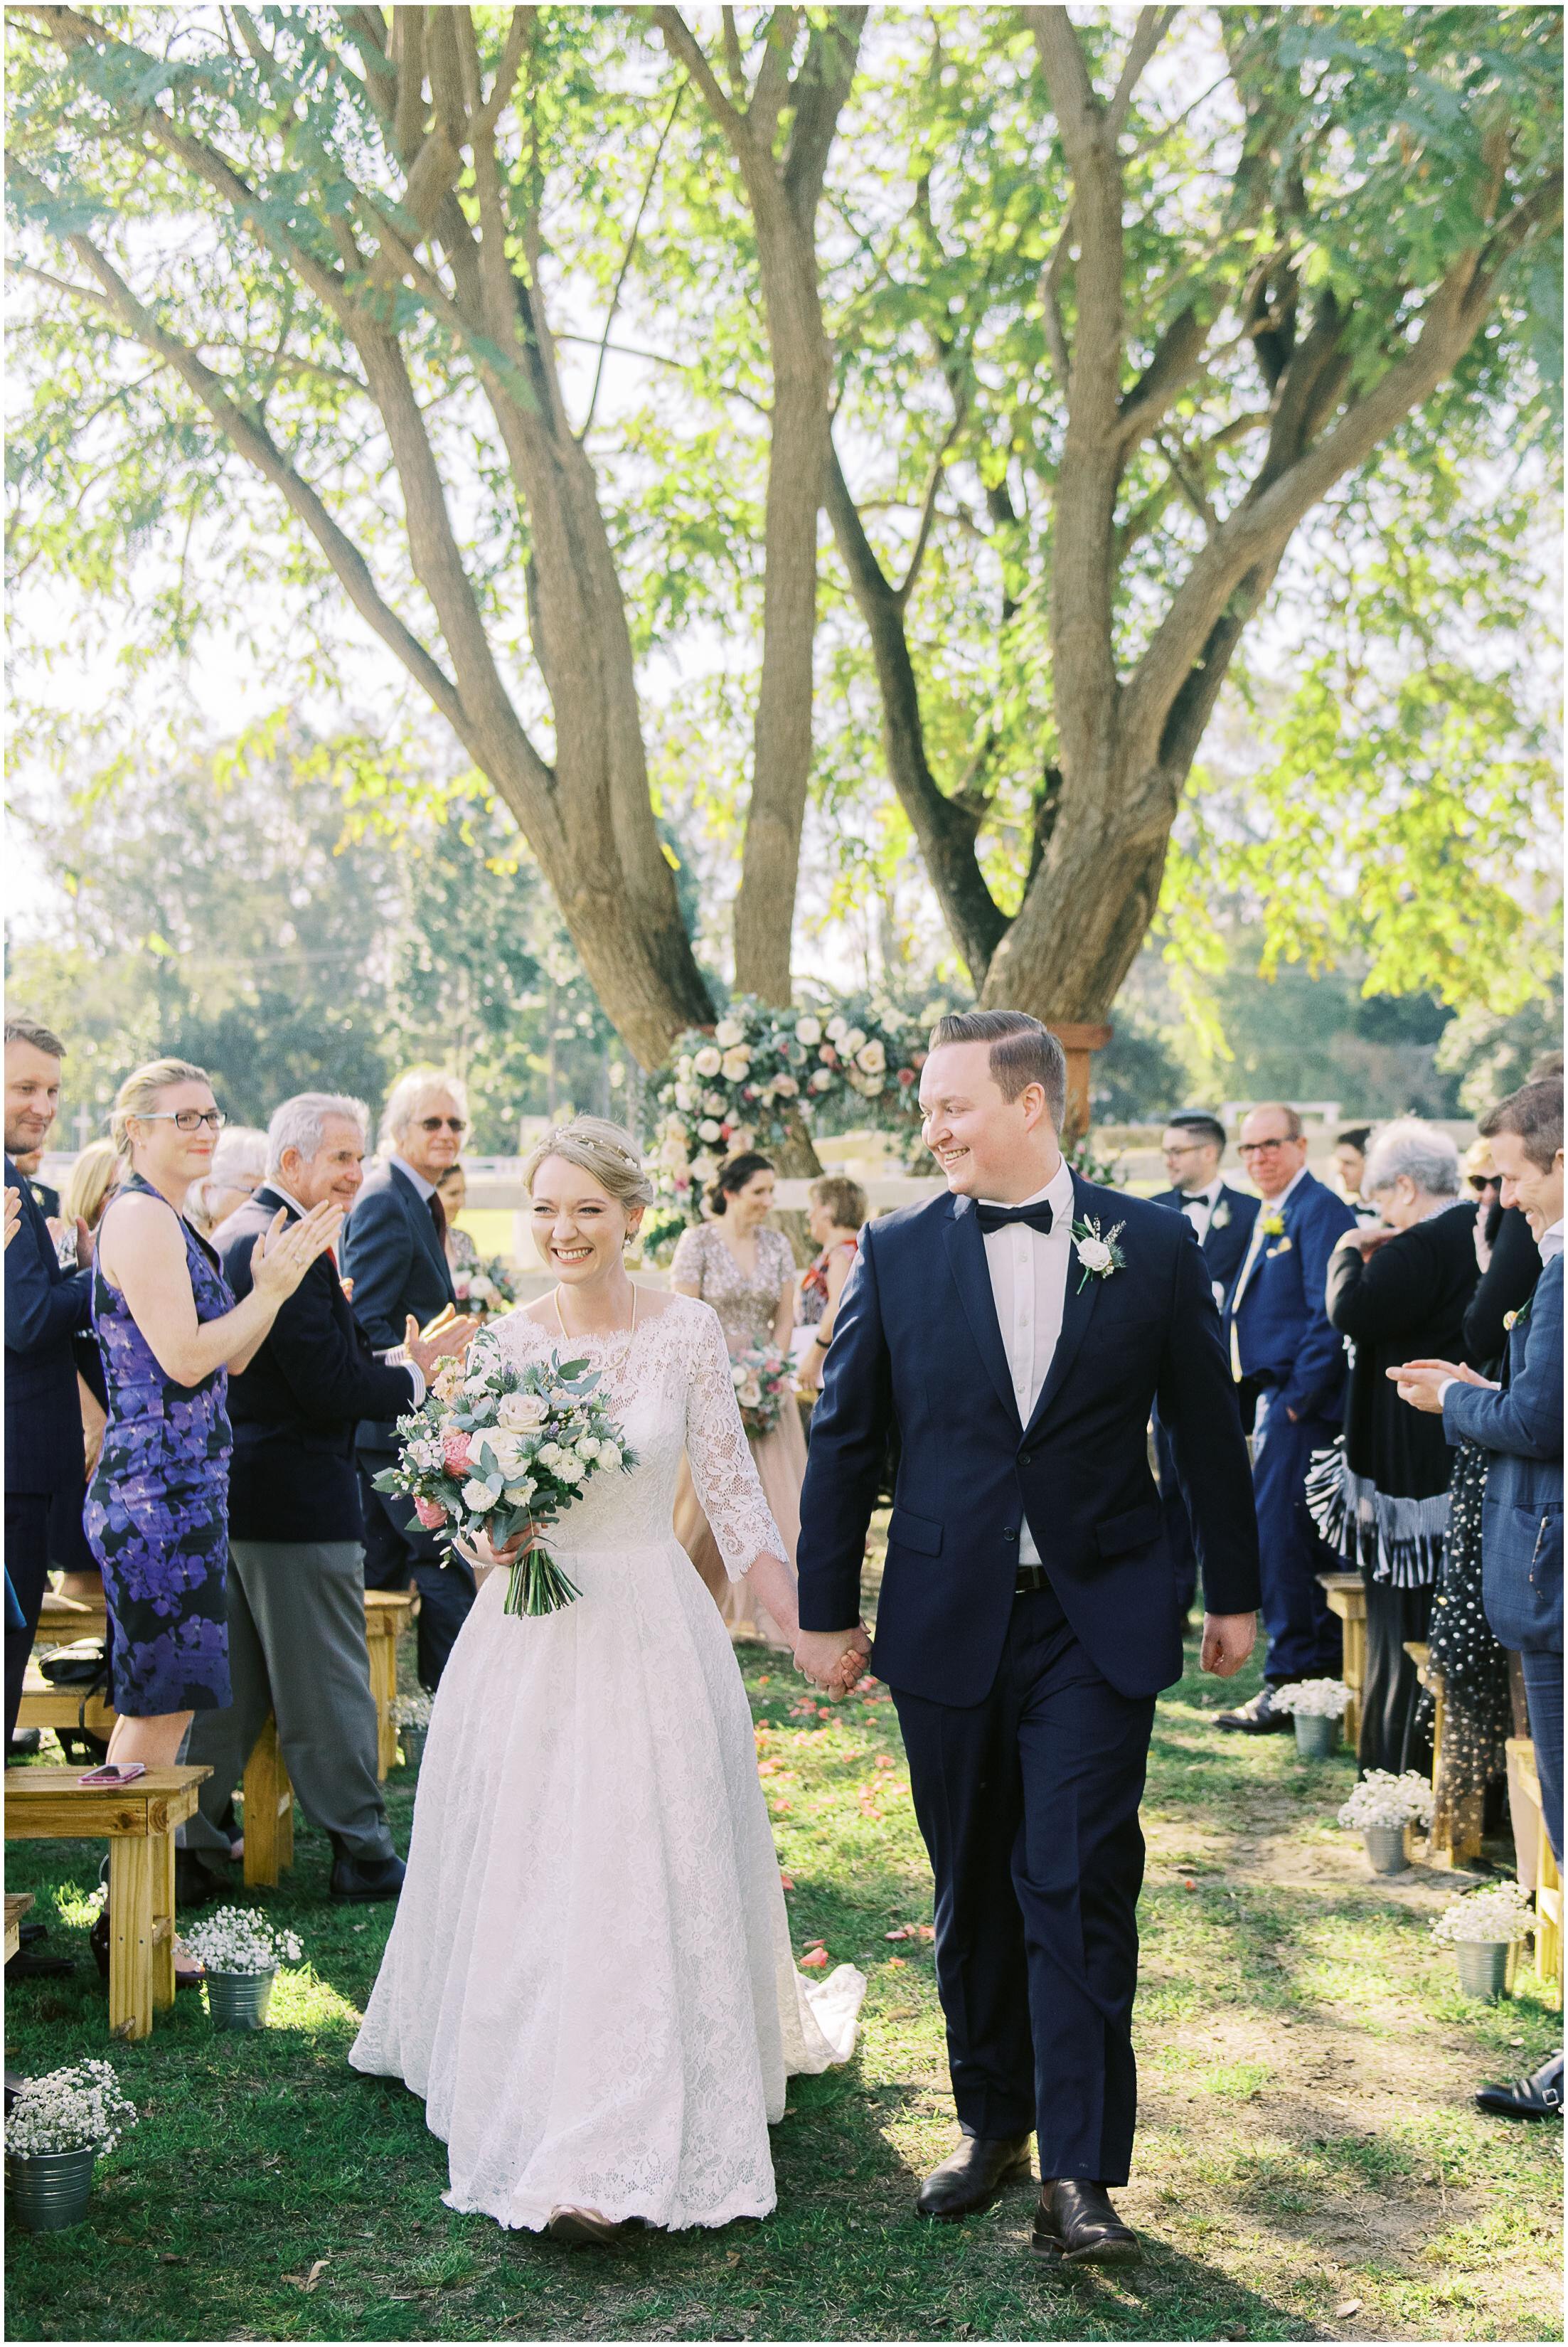 brisbane-fine-art-wedding-photographer-lauren-olivia-luxury-wedding-australia-13.jpg